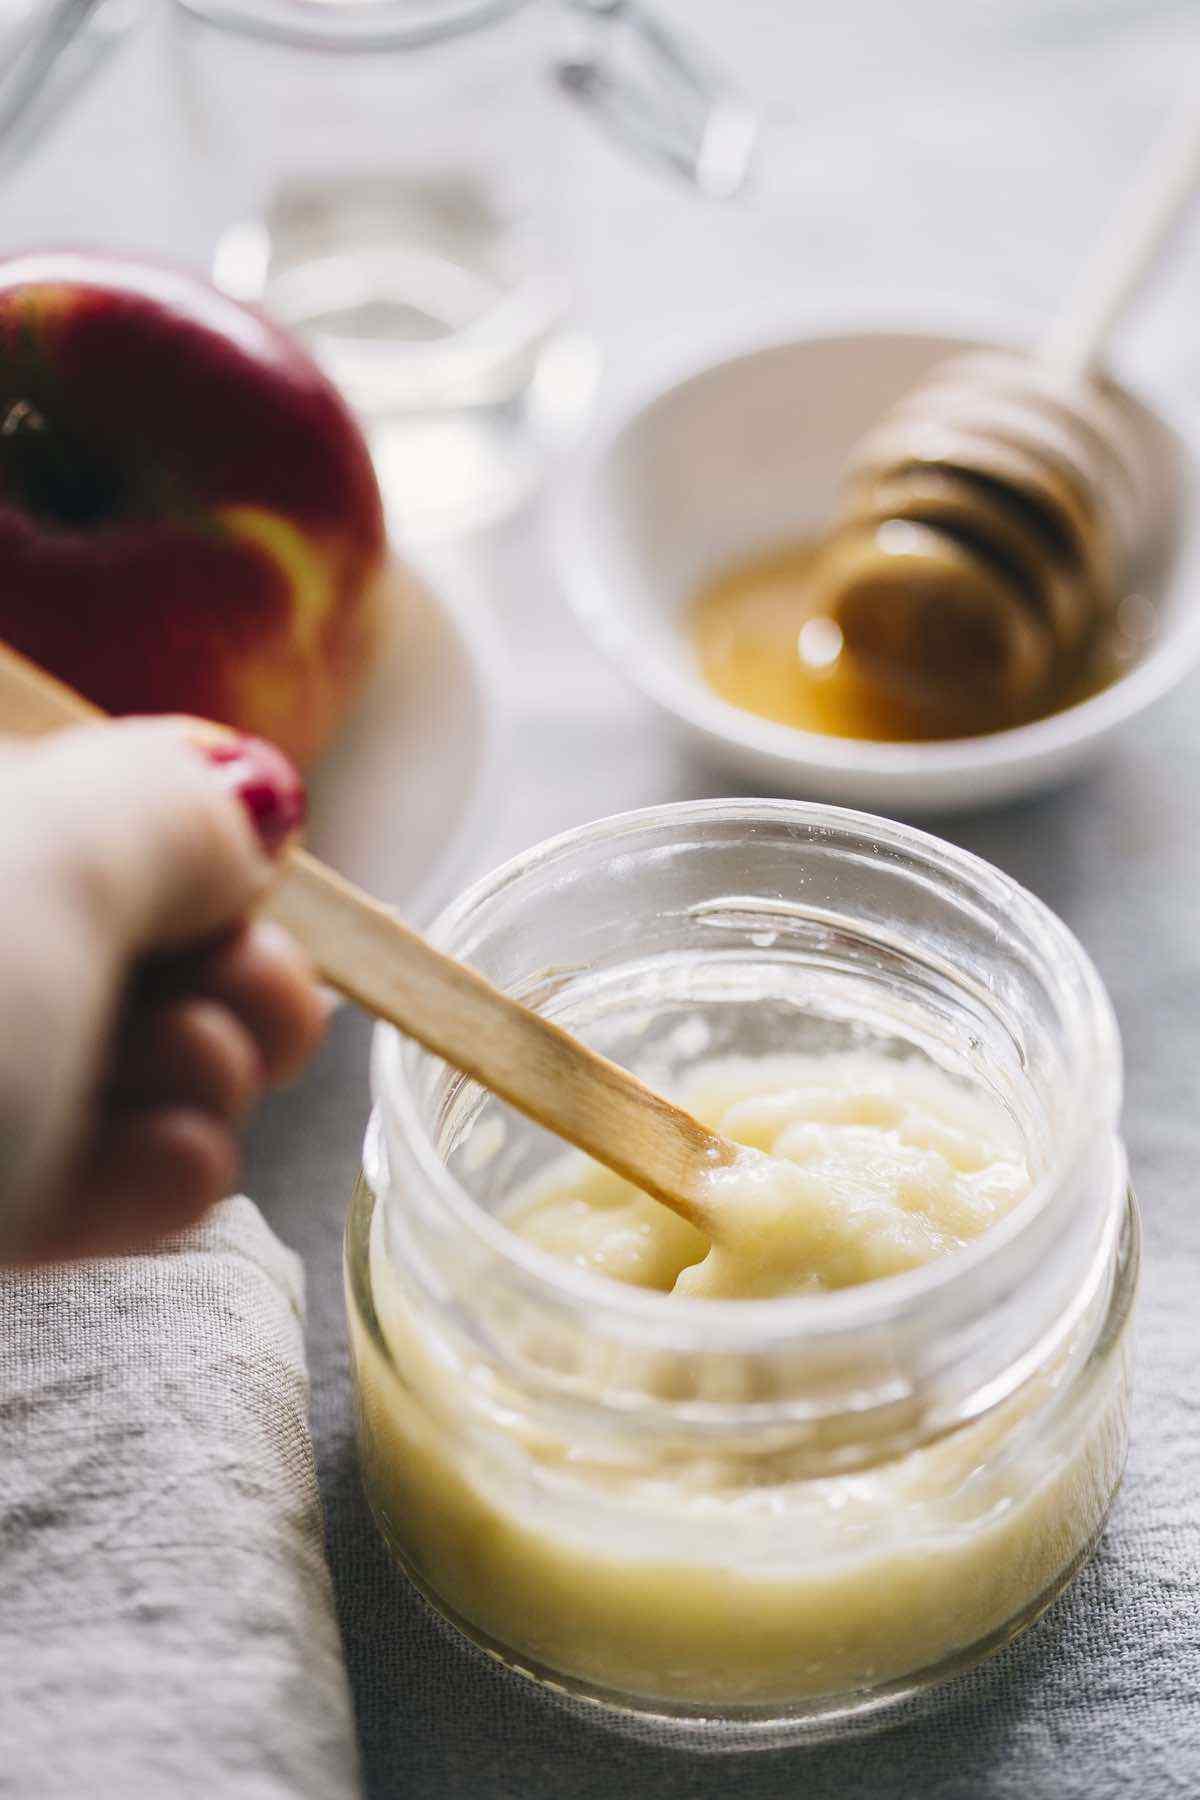 Apple Cider Vinegar Skin Peel